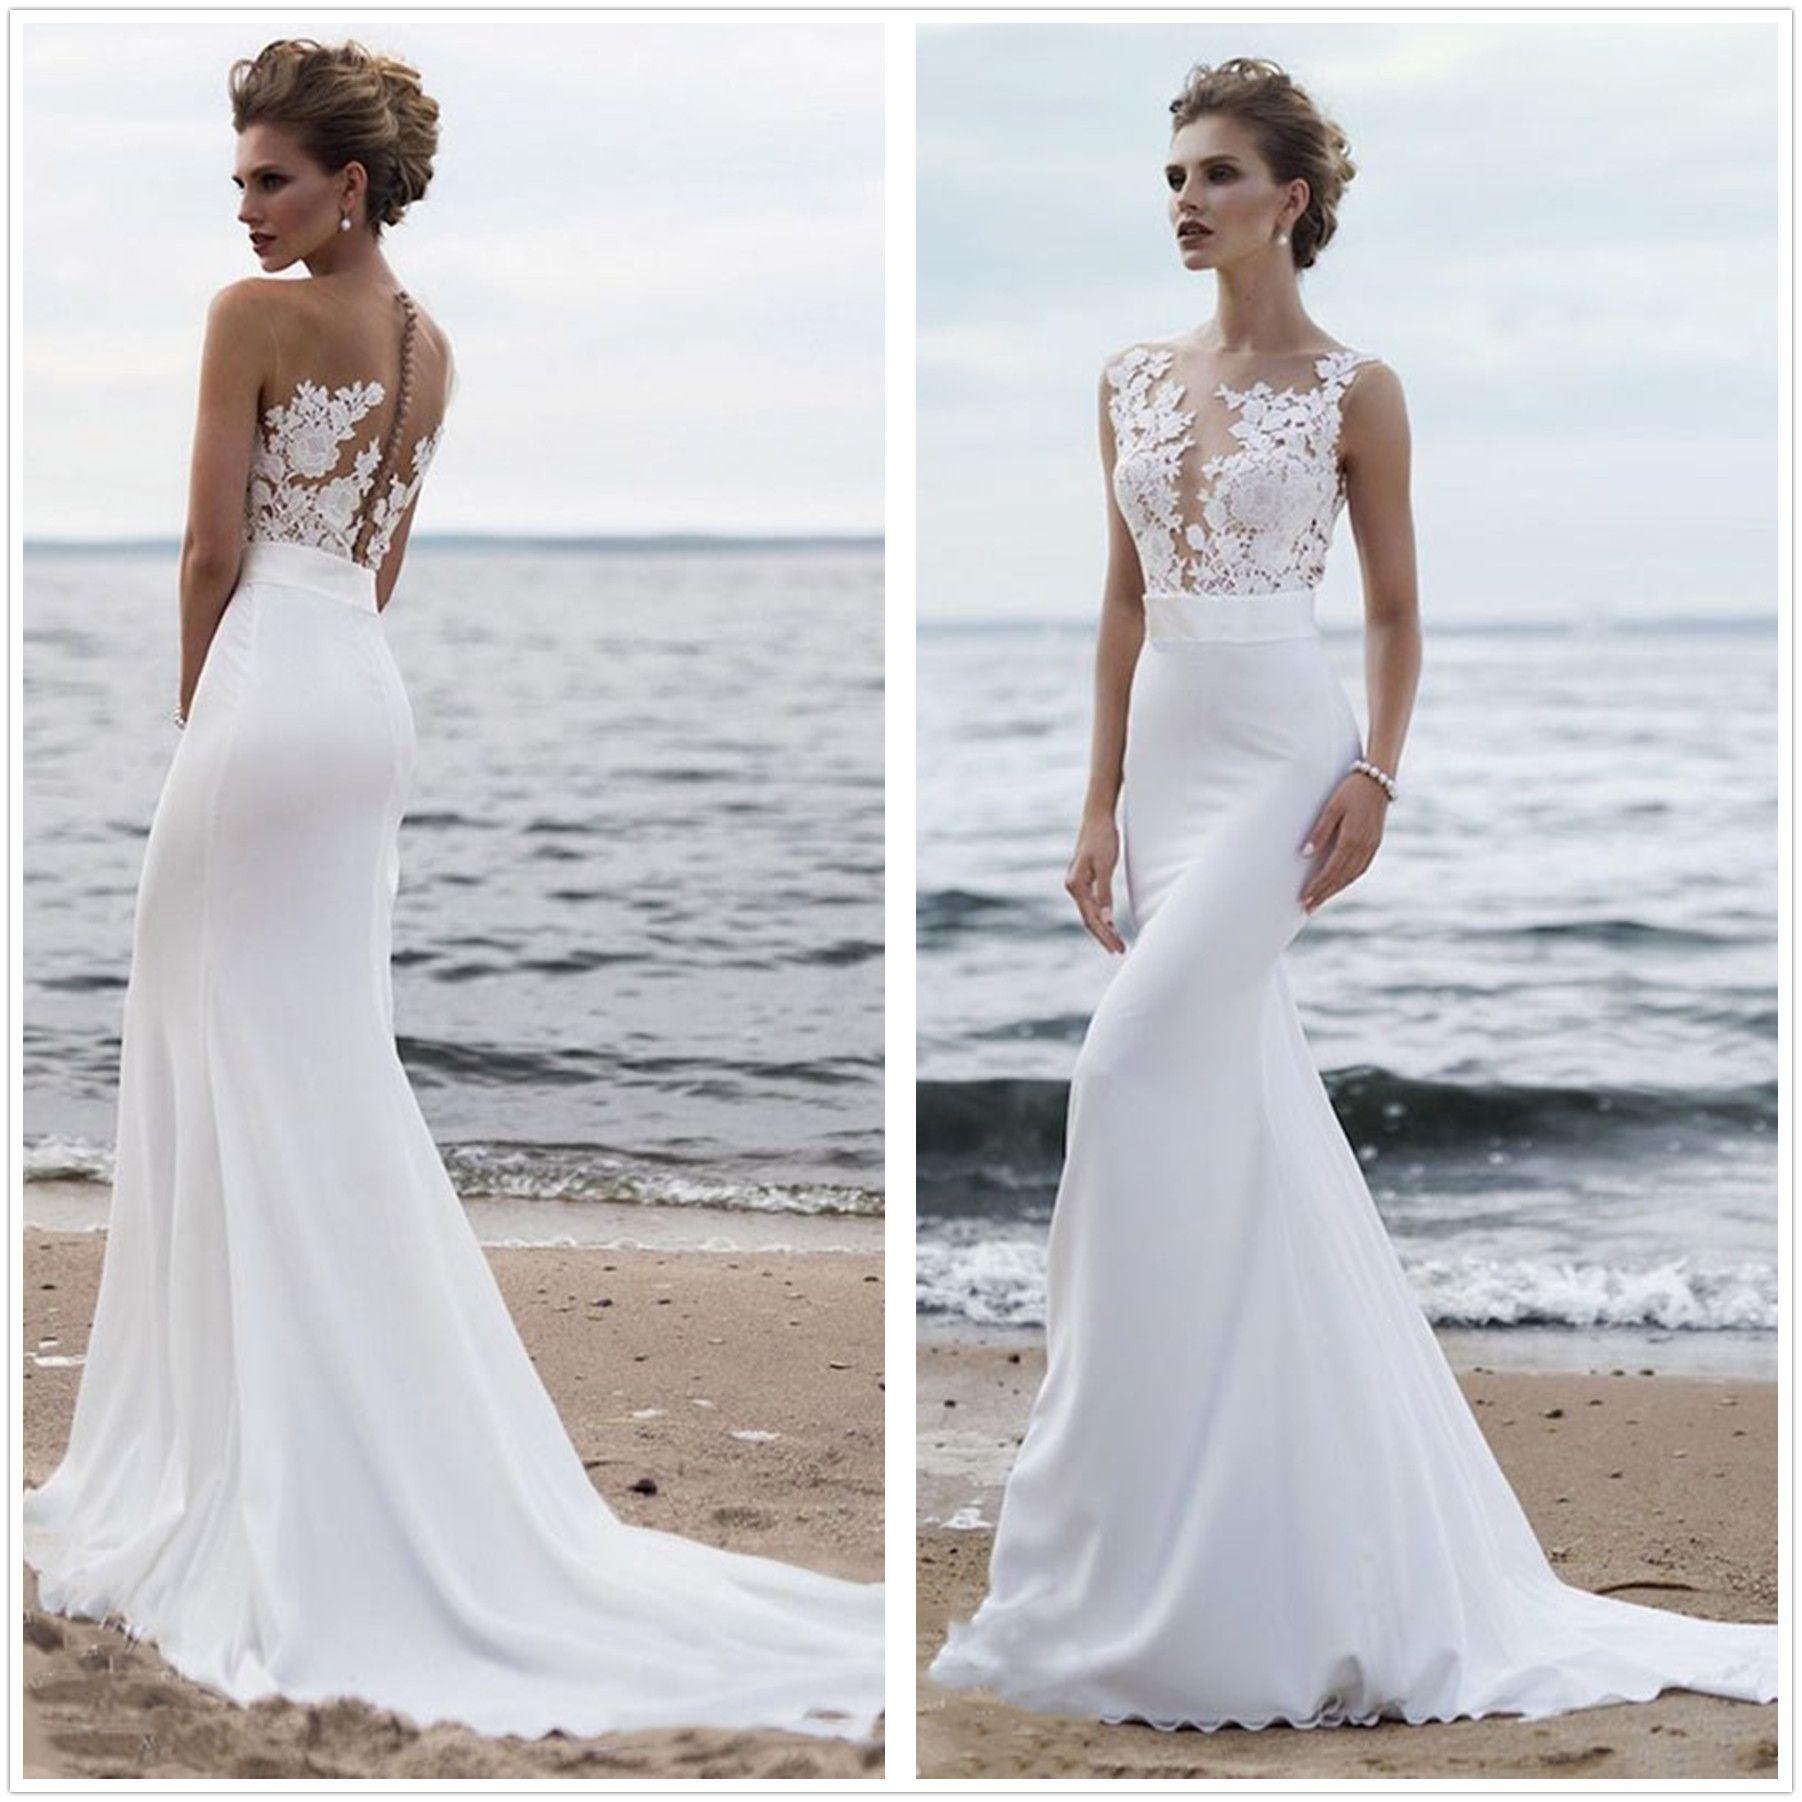 Elegant Sheer Mesh Top Lace Mermaid Wedding Dresses 2019 Chiffon Court Train Summer Beach Wedding Bridal Gowns With Buttons